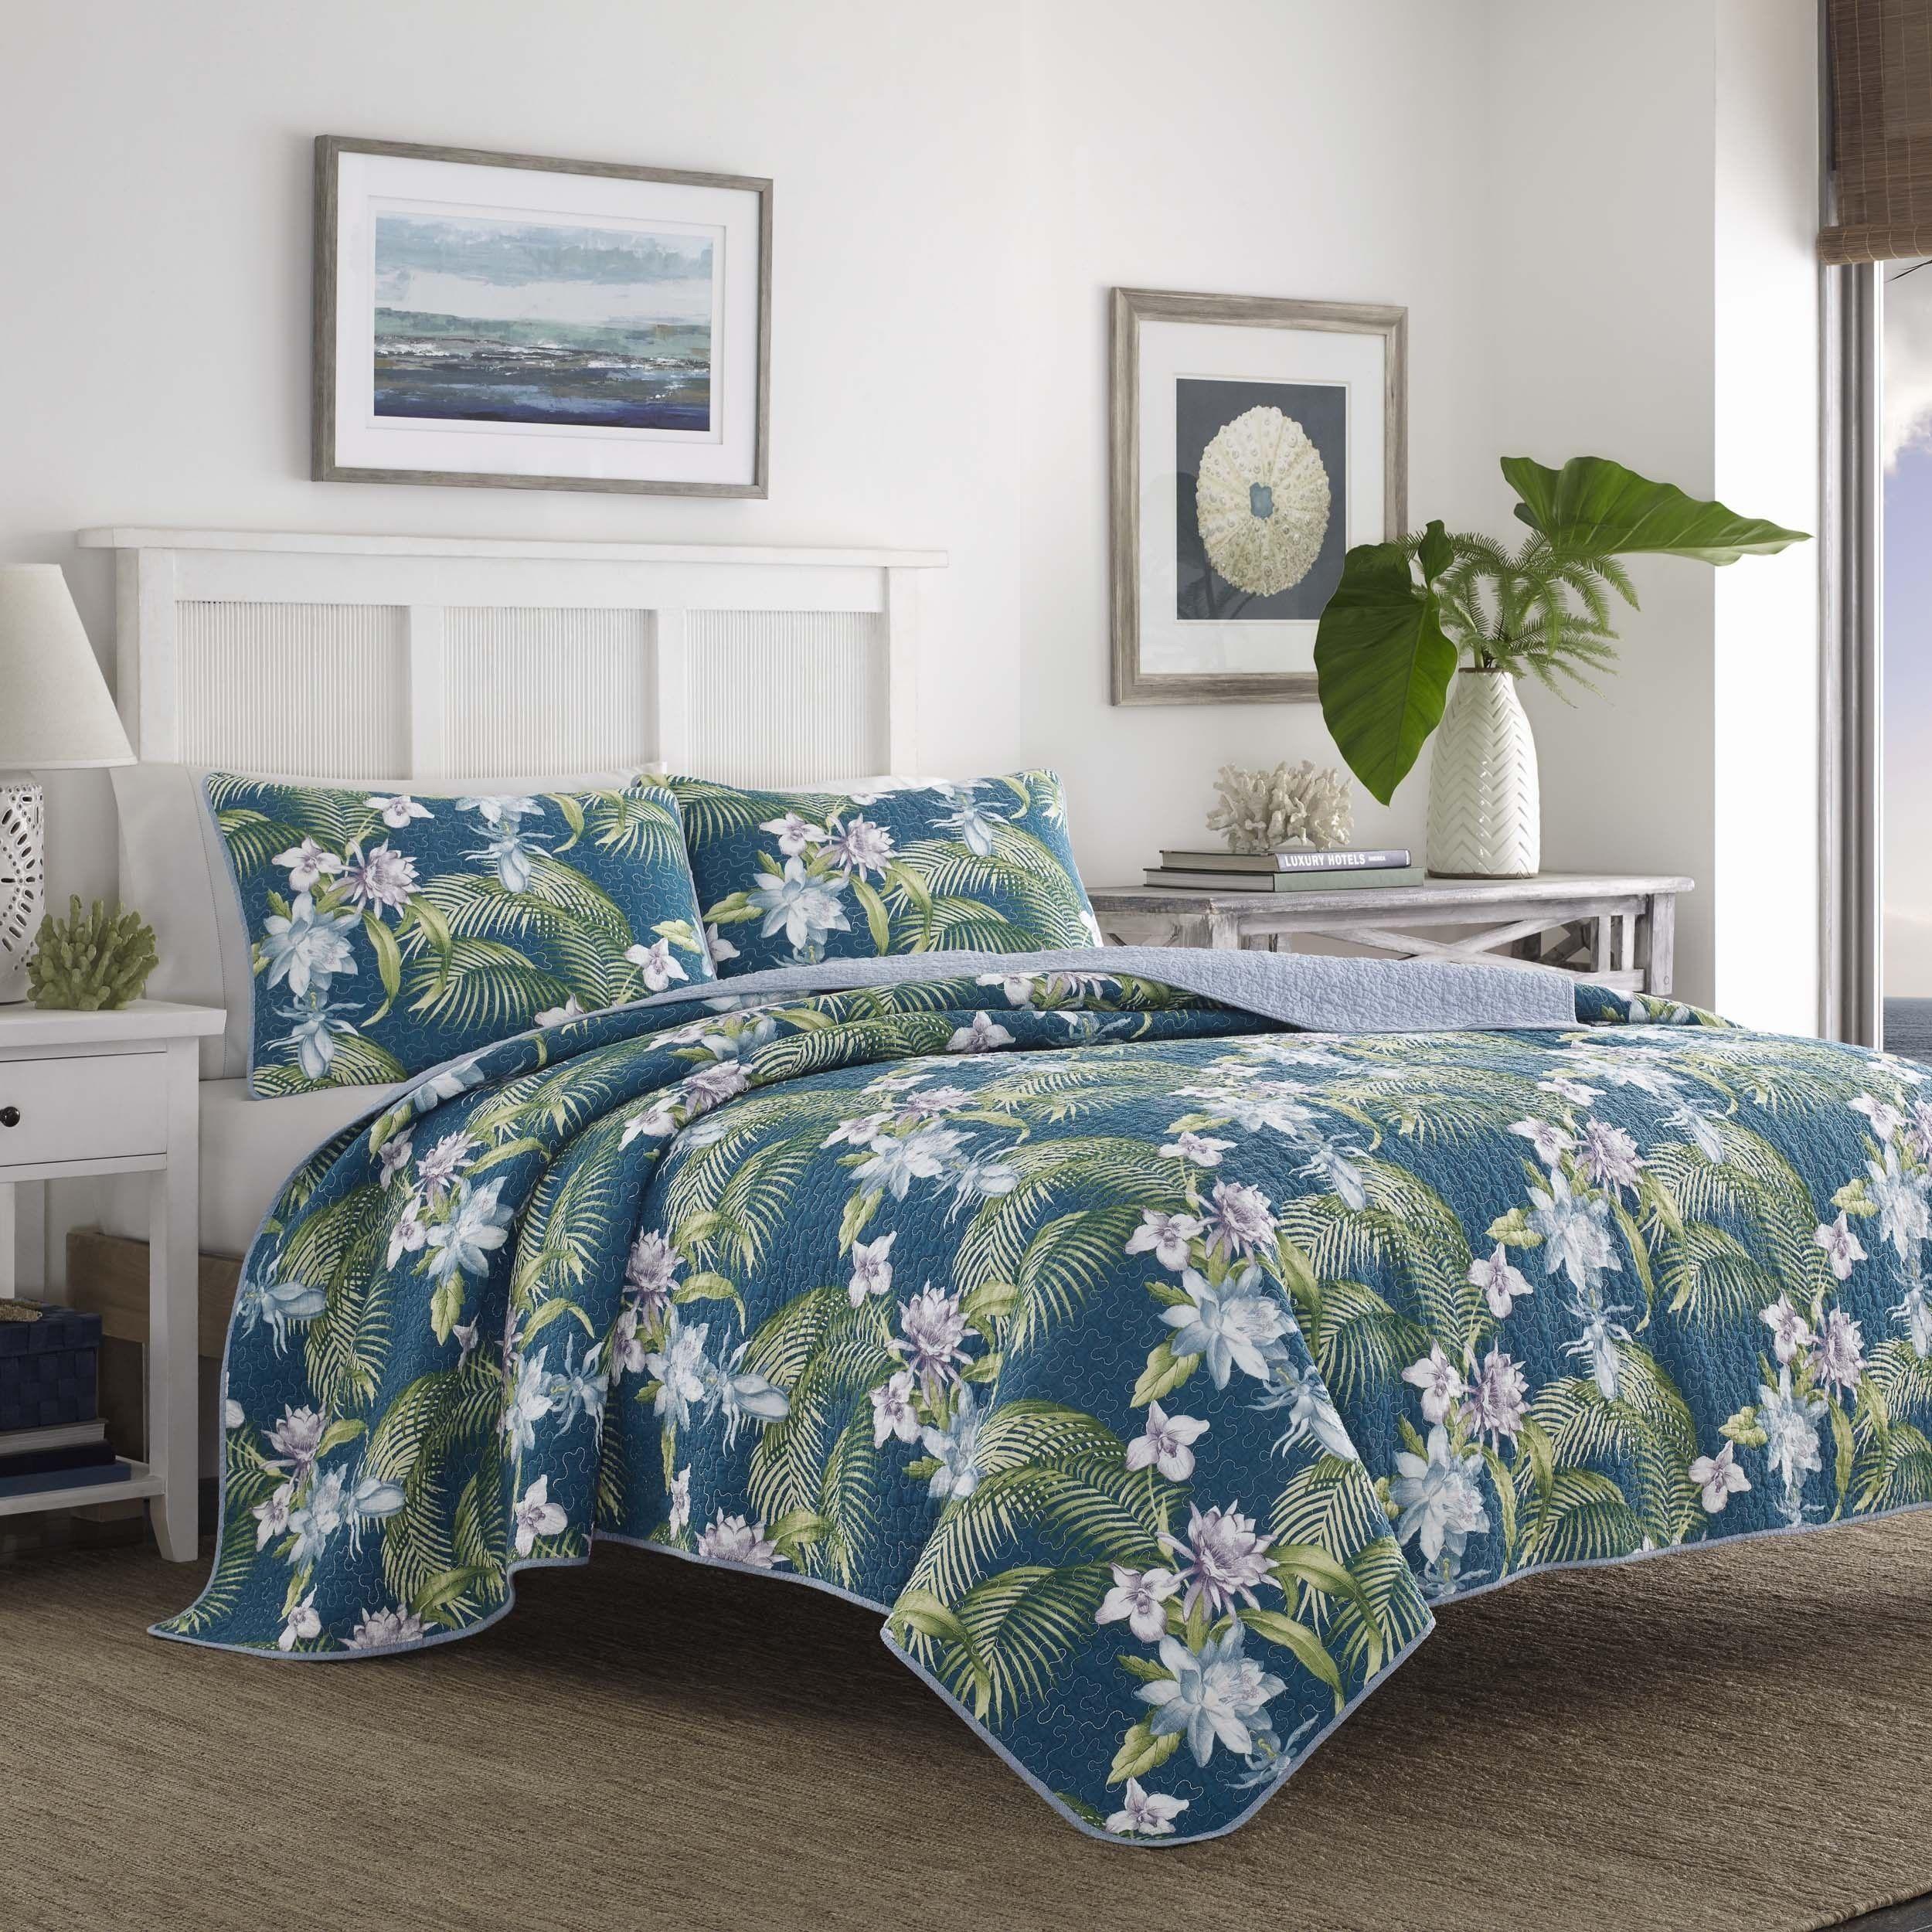 Tommy Bahama Southern Breeze Cotton Quilt Set | Overstock.com ... : overstock quilts queen - Adamdwight.com